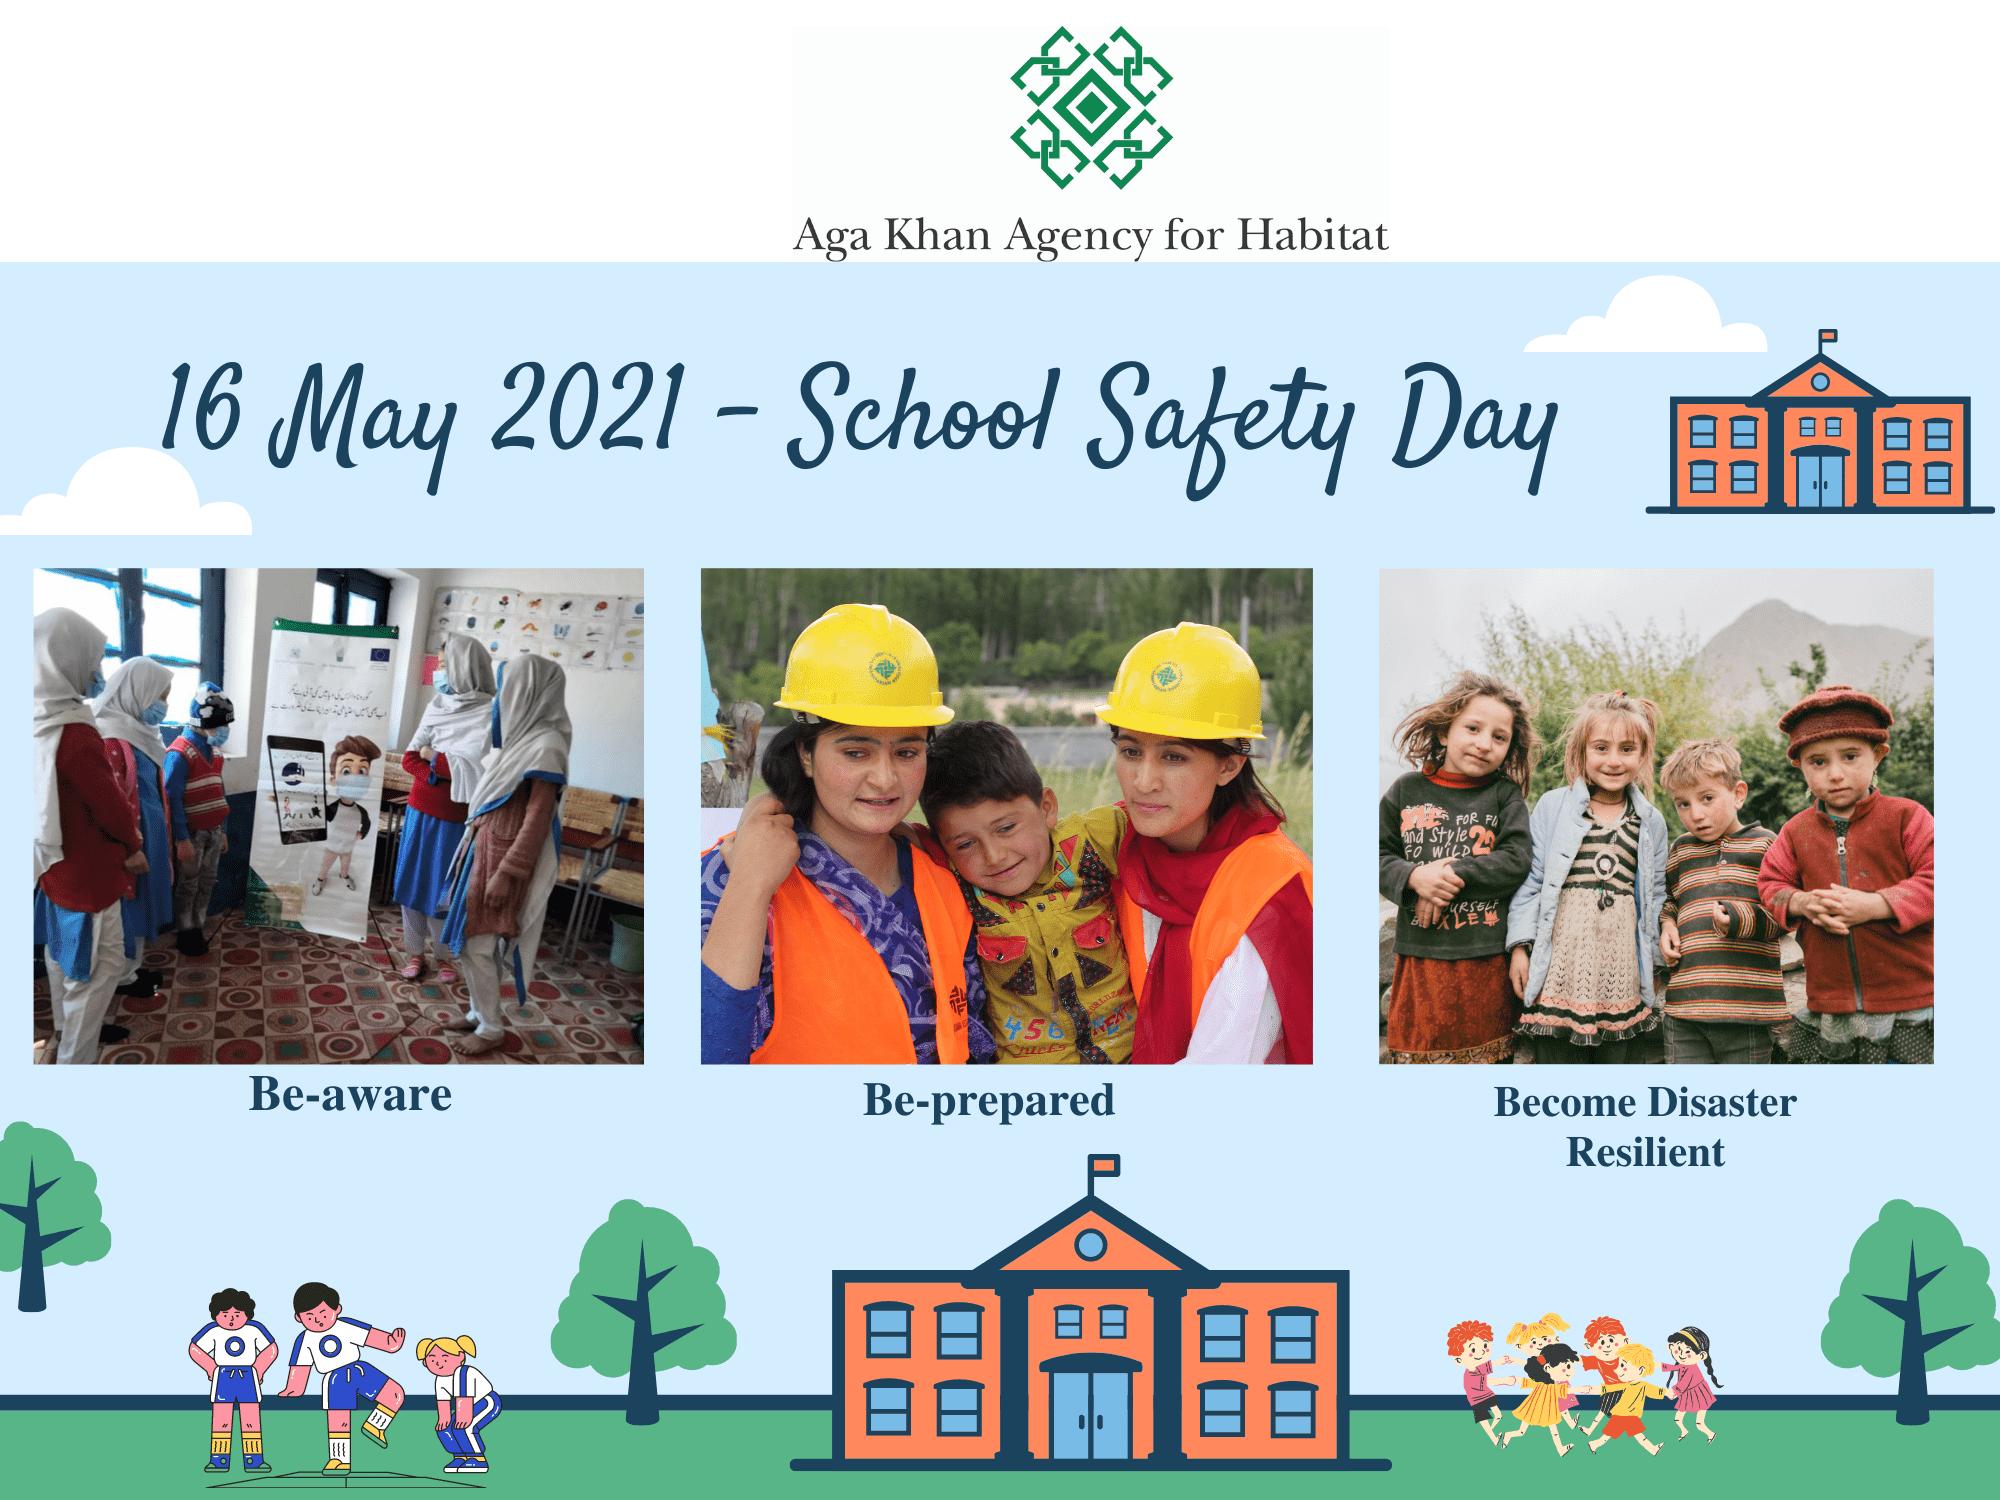 Aga Khan Agency for Habitat celebrates National School Safety Day in Pakistan